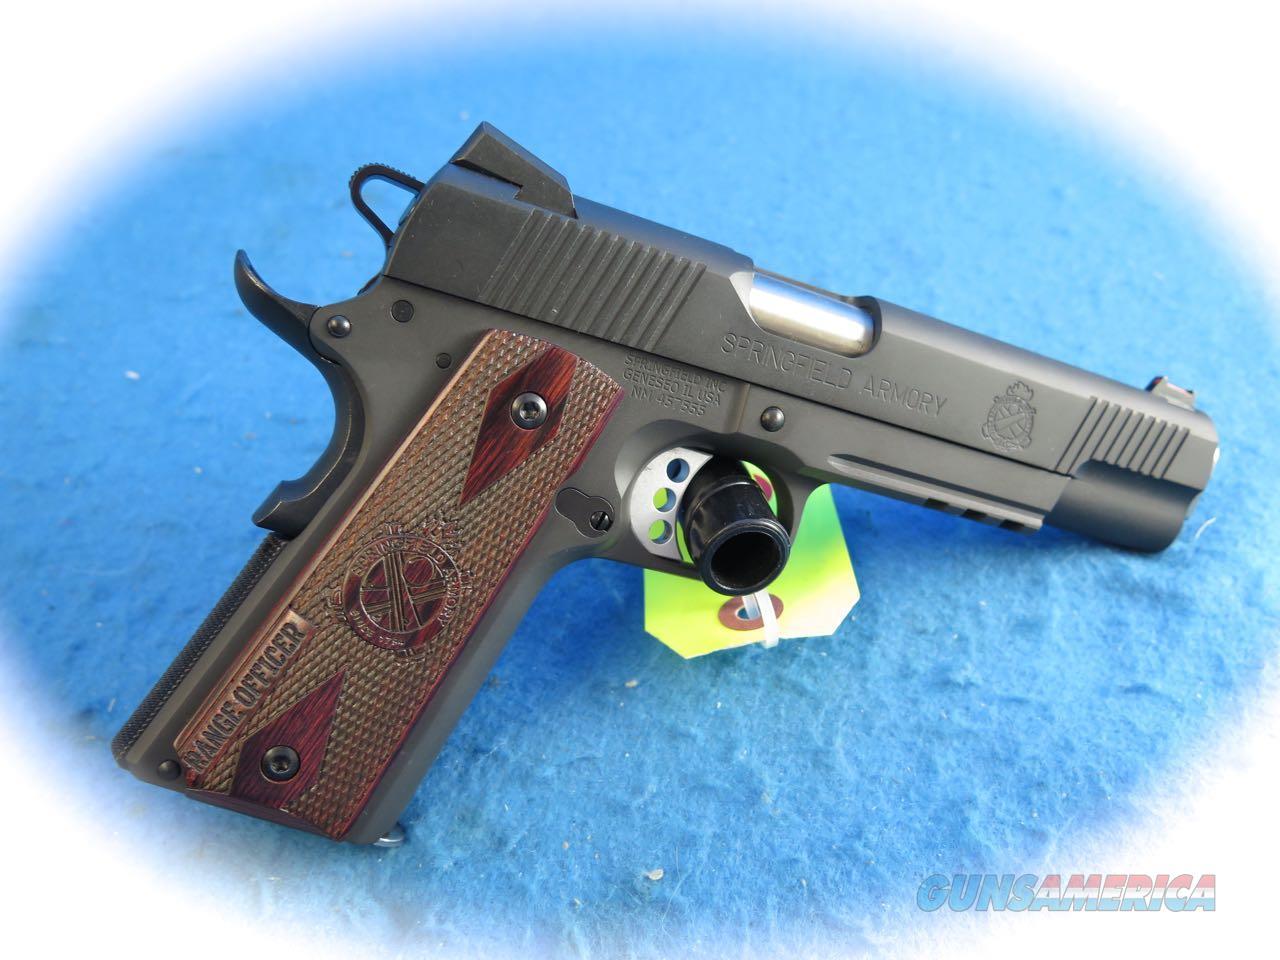 Springfield Armory 1911 Range Officer Operator 9mm Pistol Model PI9130LP **New**  Guns > Pistols > Springfield Armory Pistols > 1911 Type